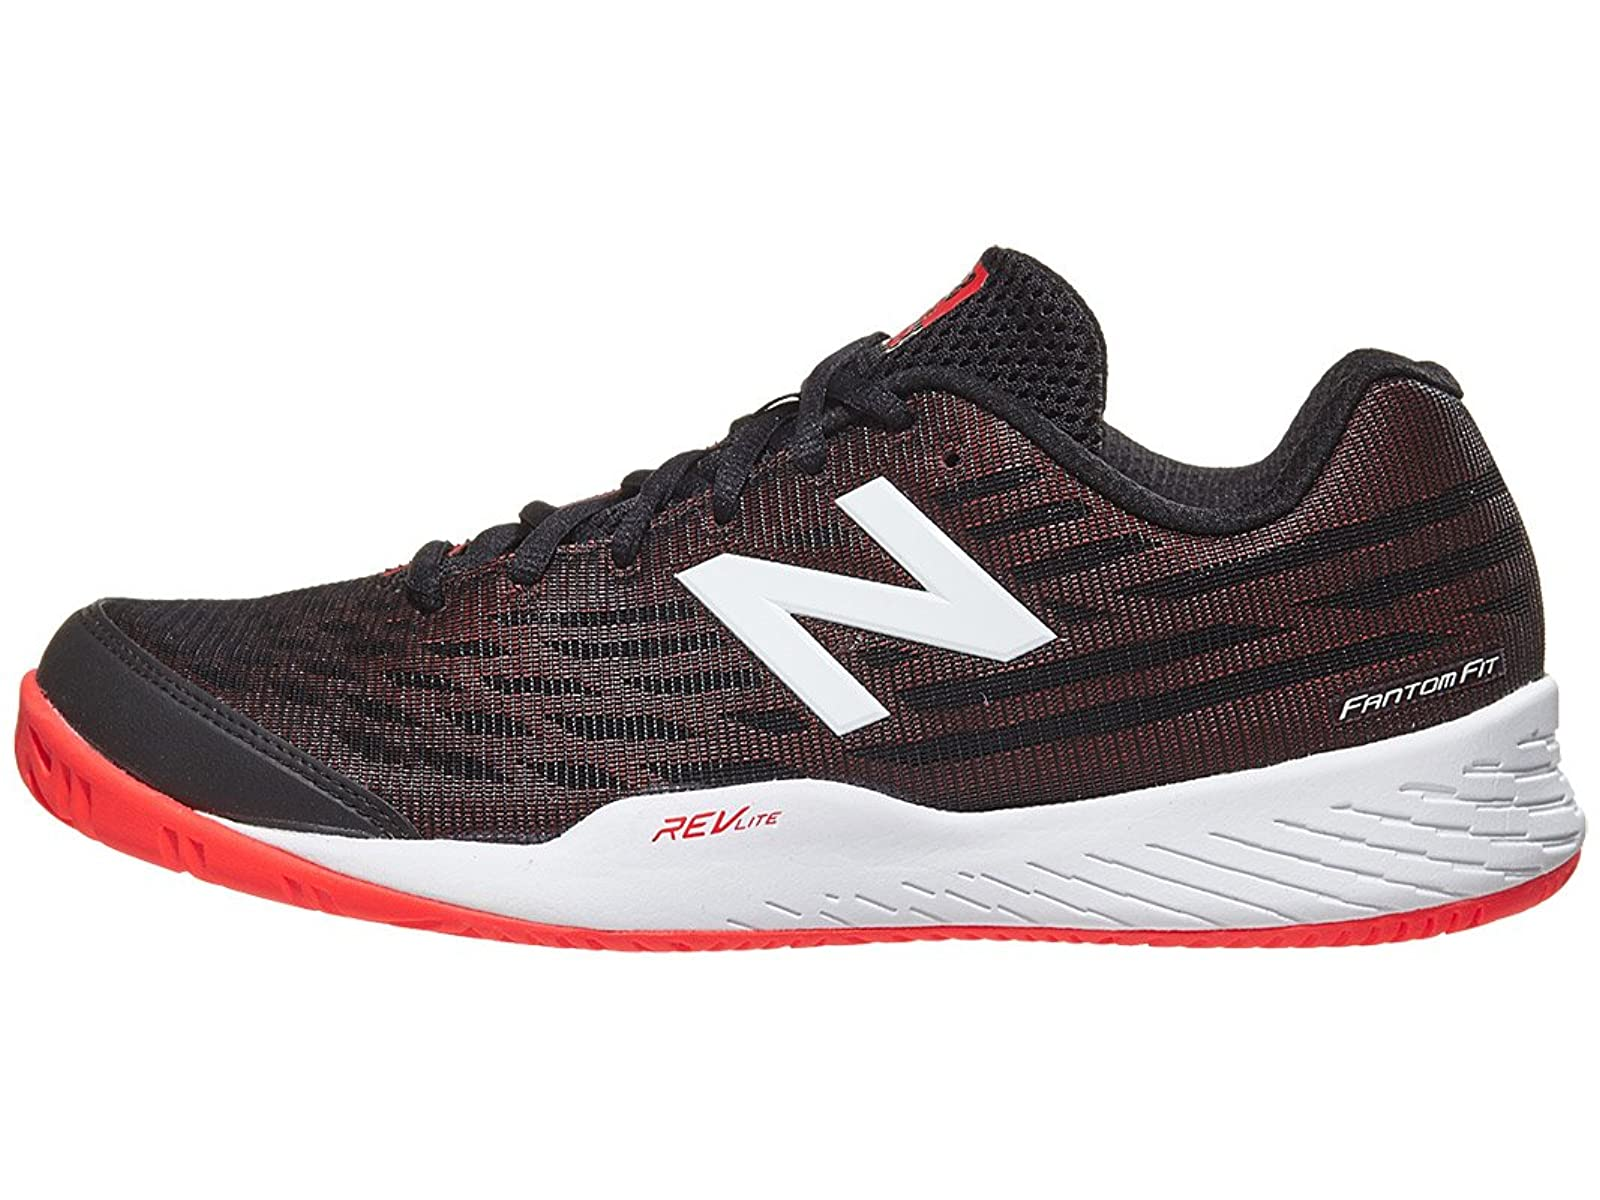 New Balance Men's 896v2 Tennis Shoe